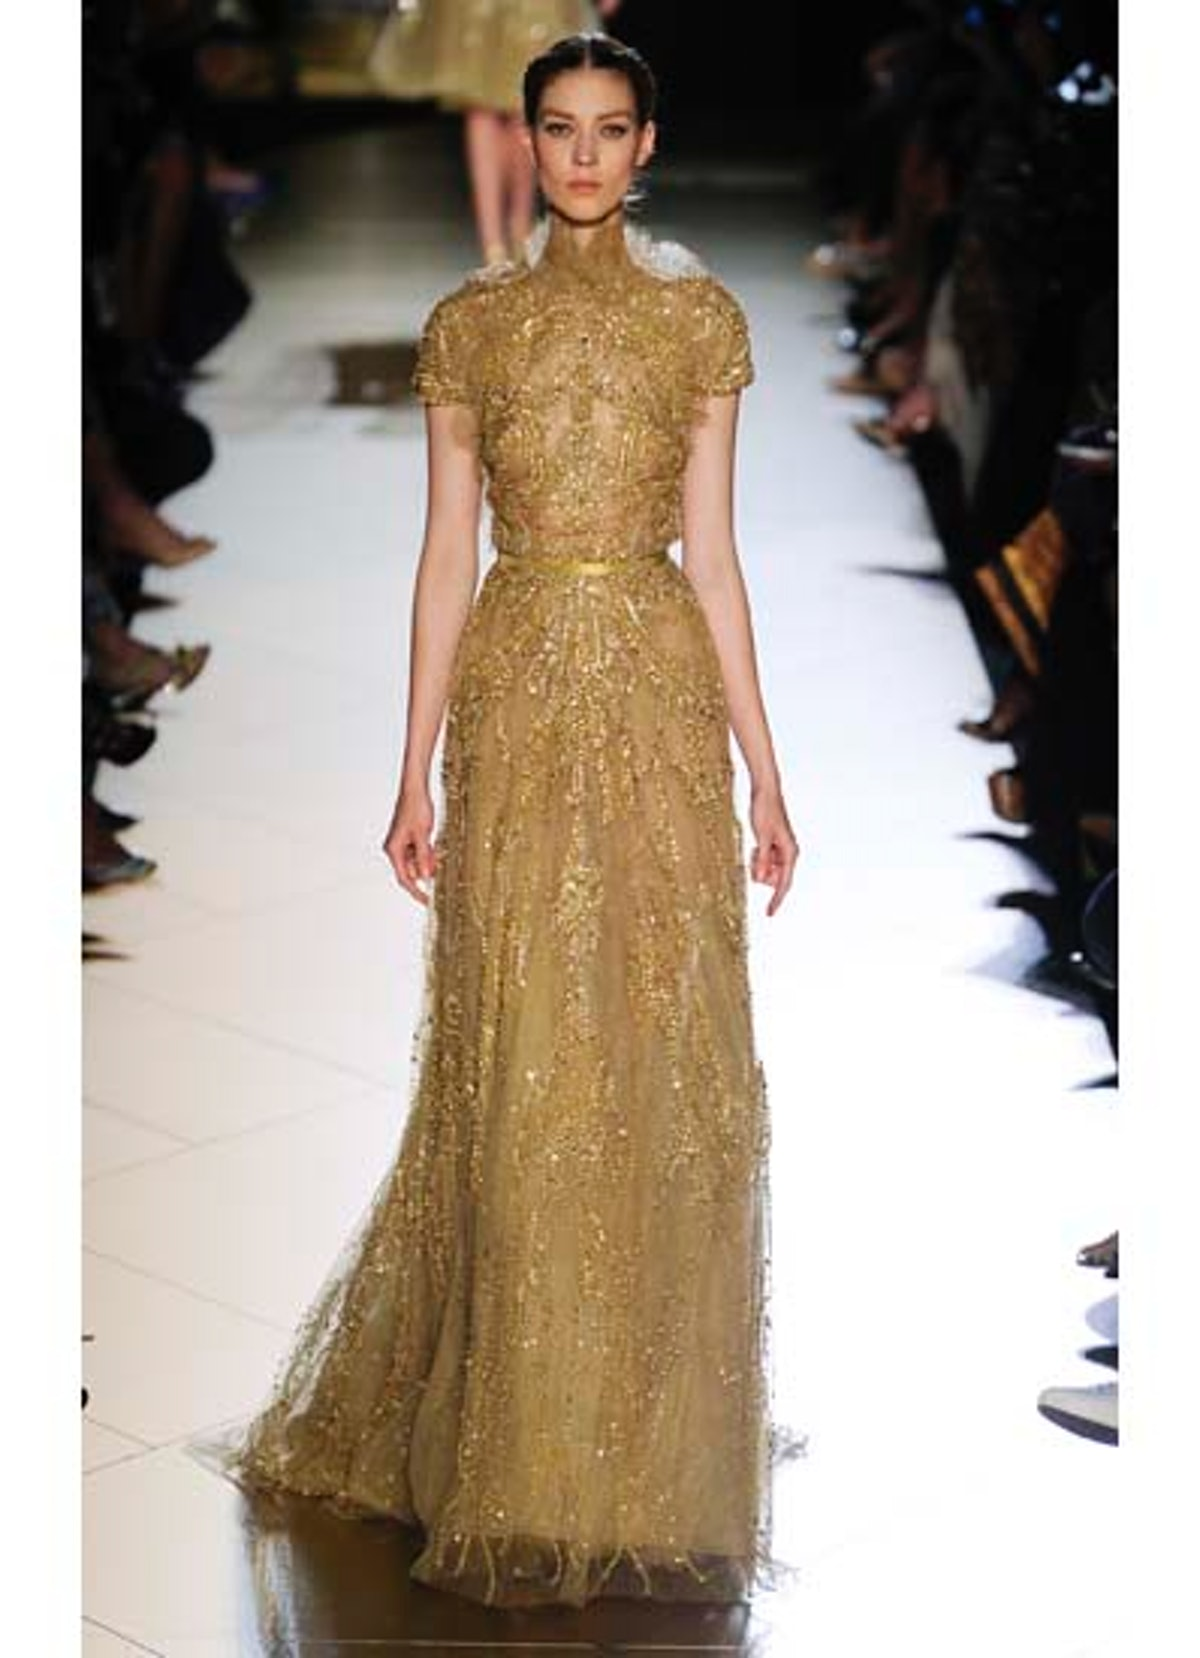 fass-elie-saab-couture-2012-runway-42-v.jpg